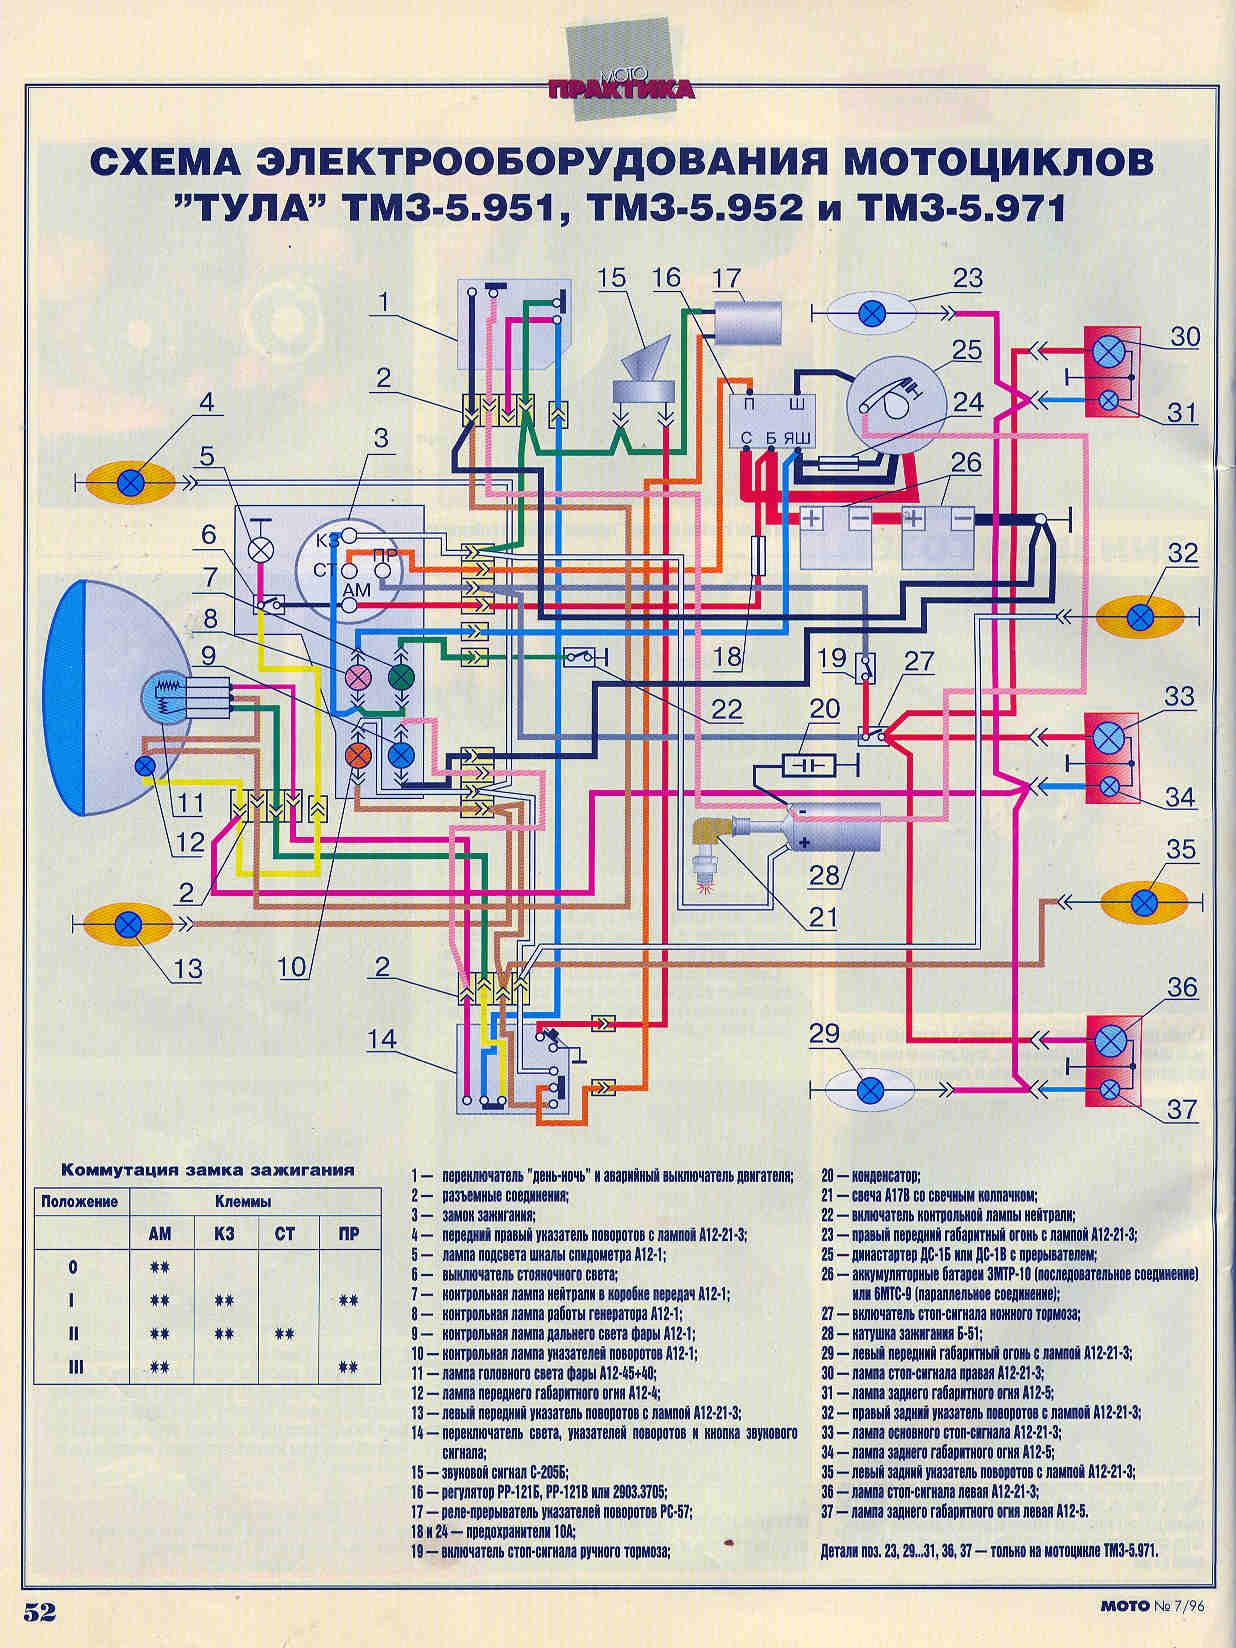 Иж юпитер 4 схема электропроводки фото